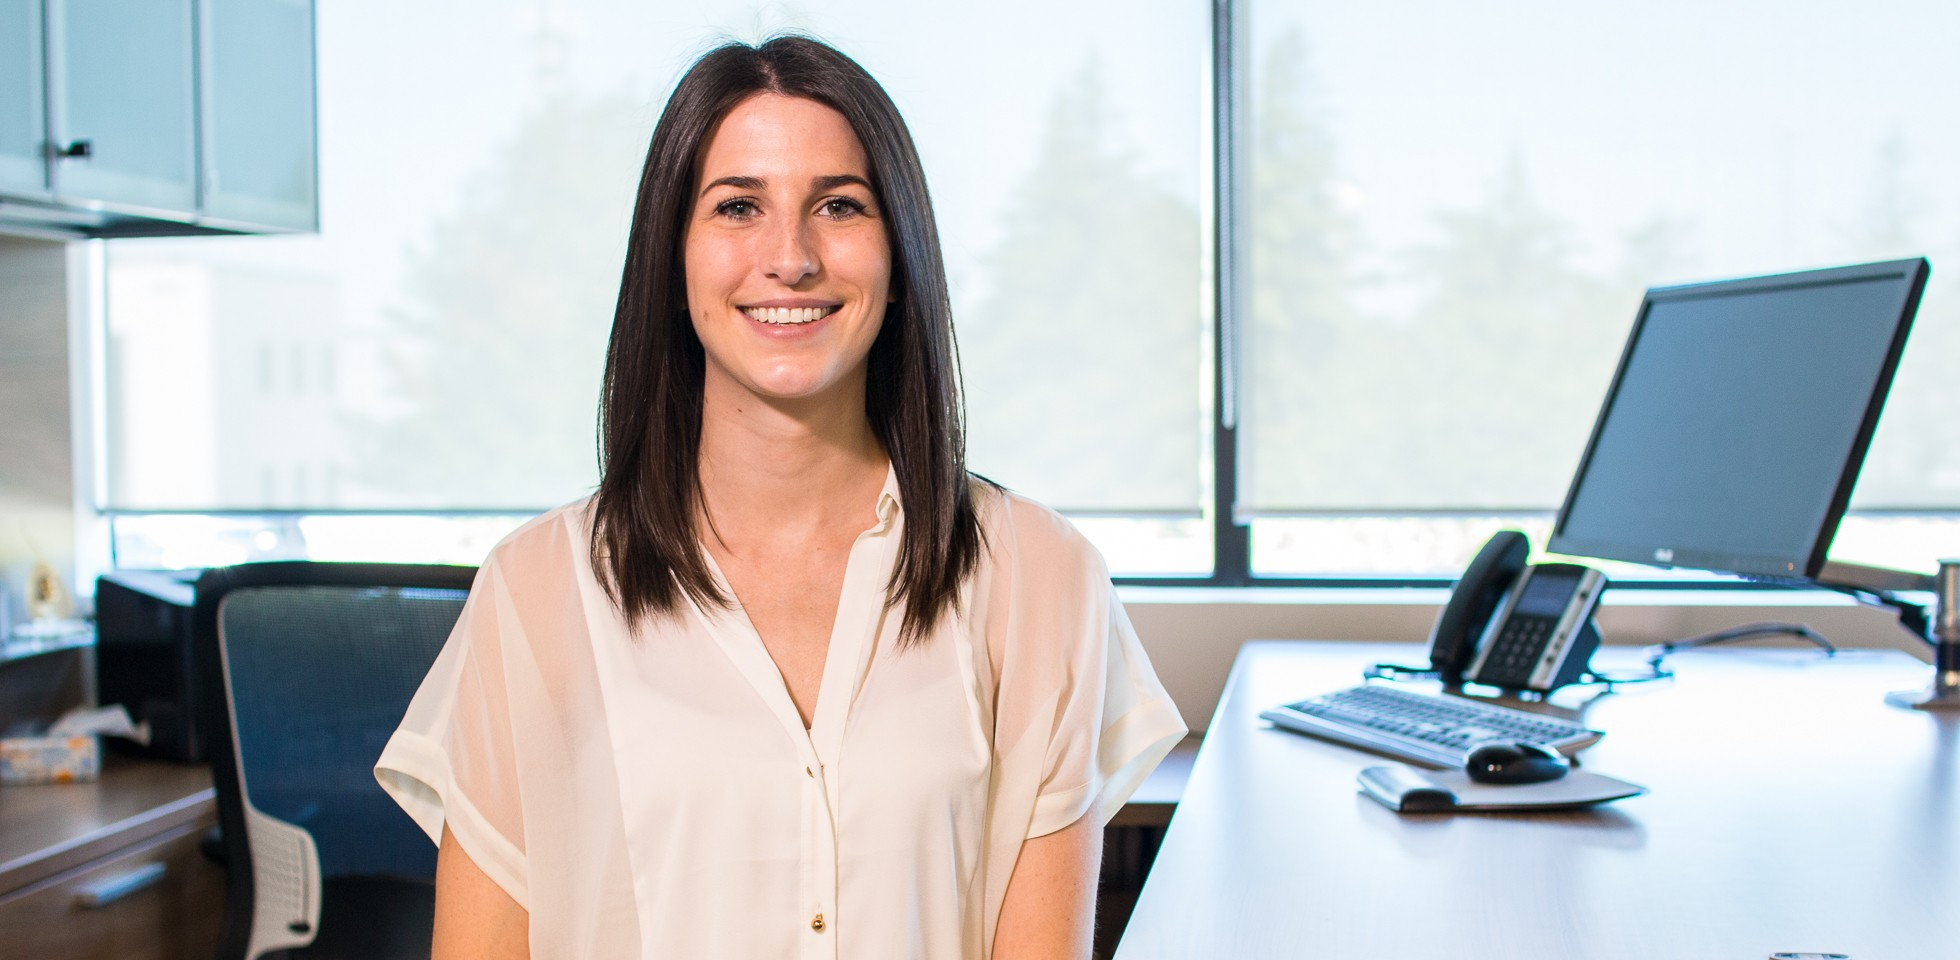 Kristen Perkin, Materials Team Leader - Baylis Medical Careers